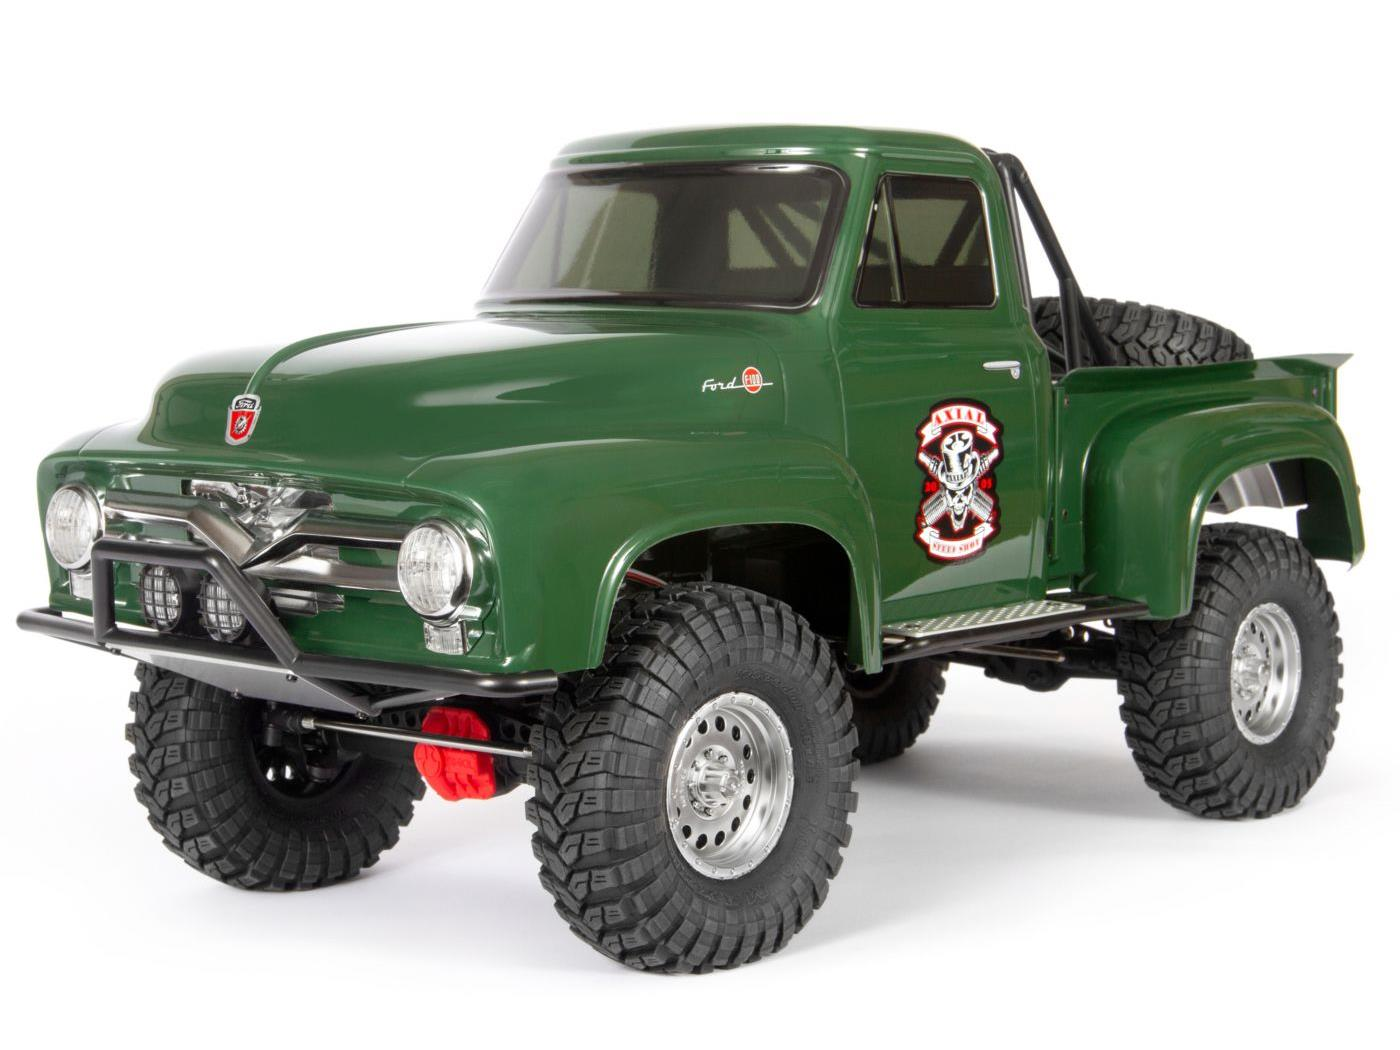 Axial SCX10 II 1955 Ford F-100 4WD RTR - Green